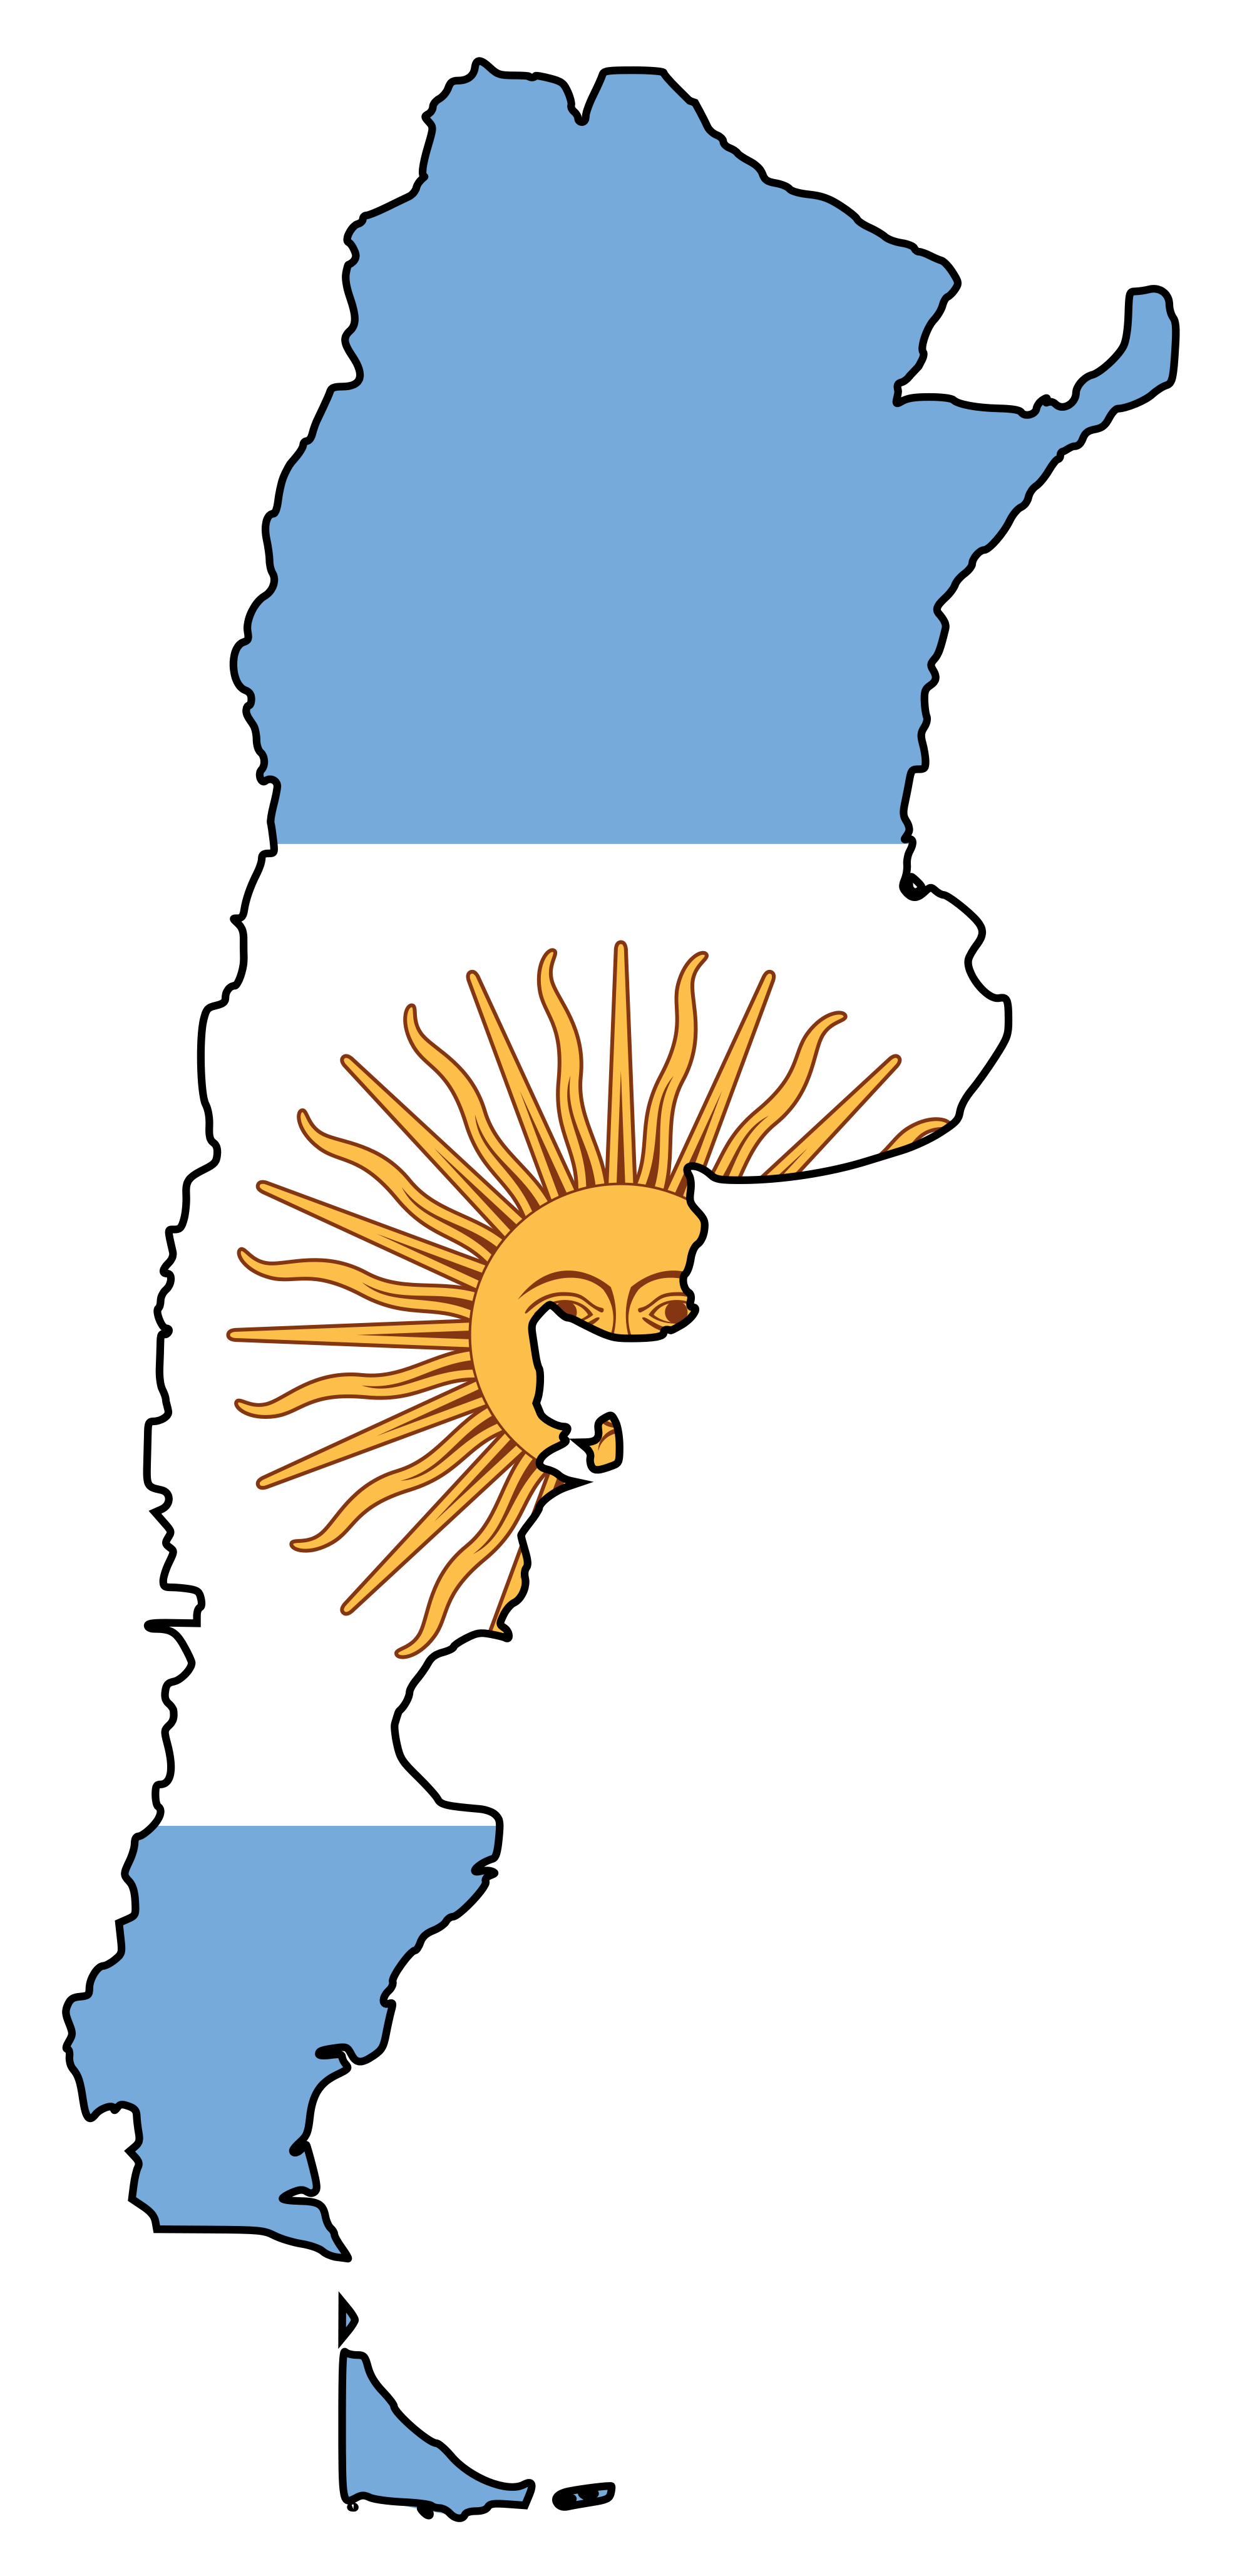 registro de marca argentina